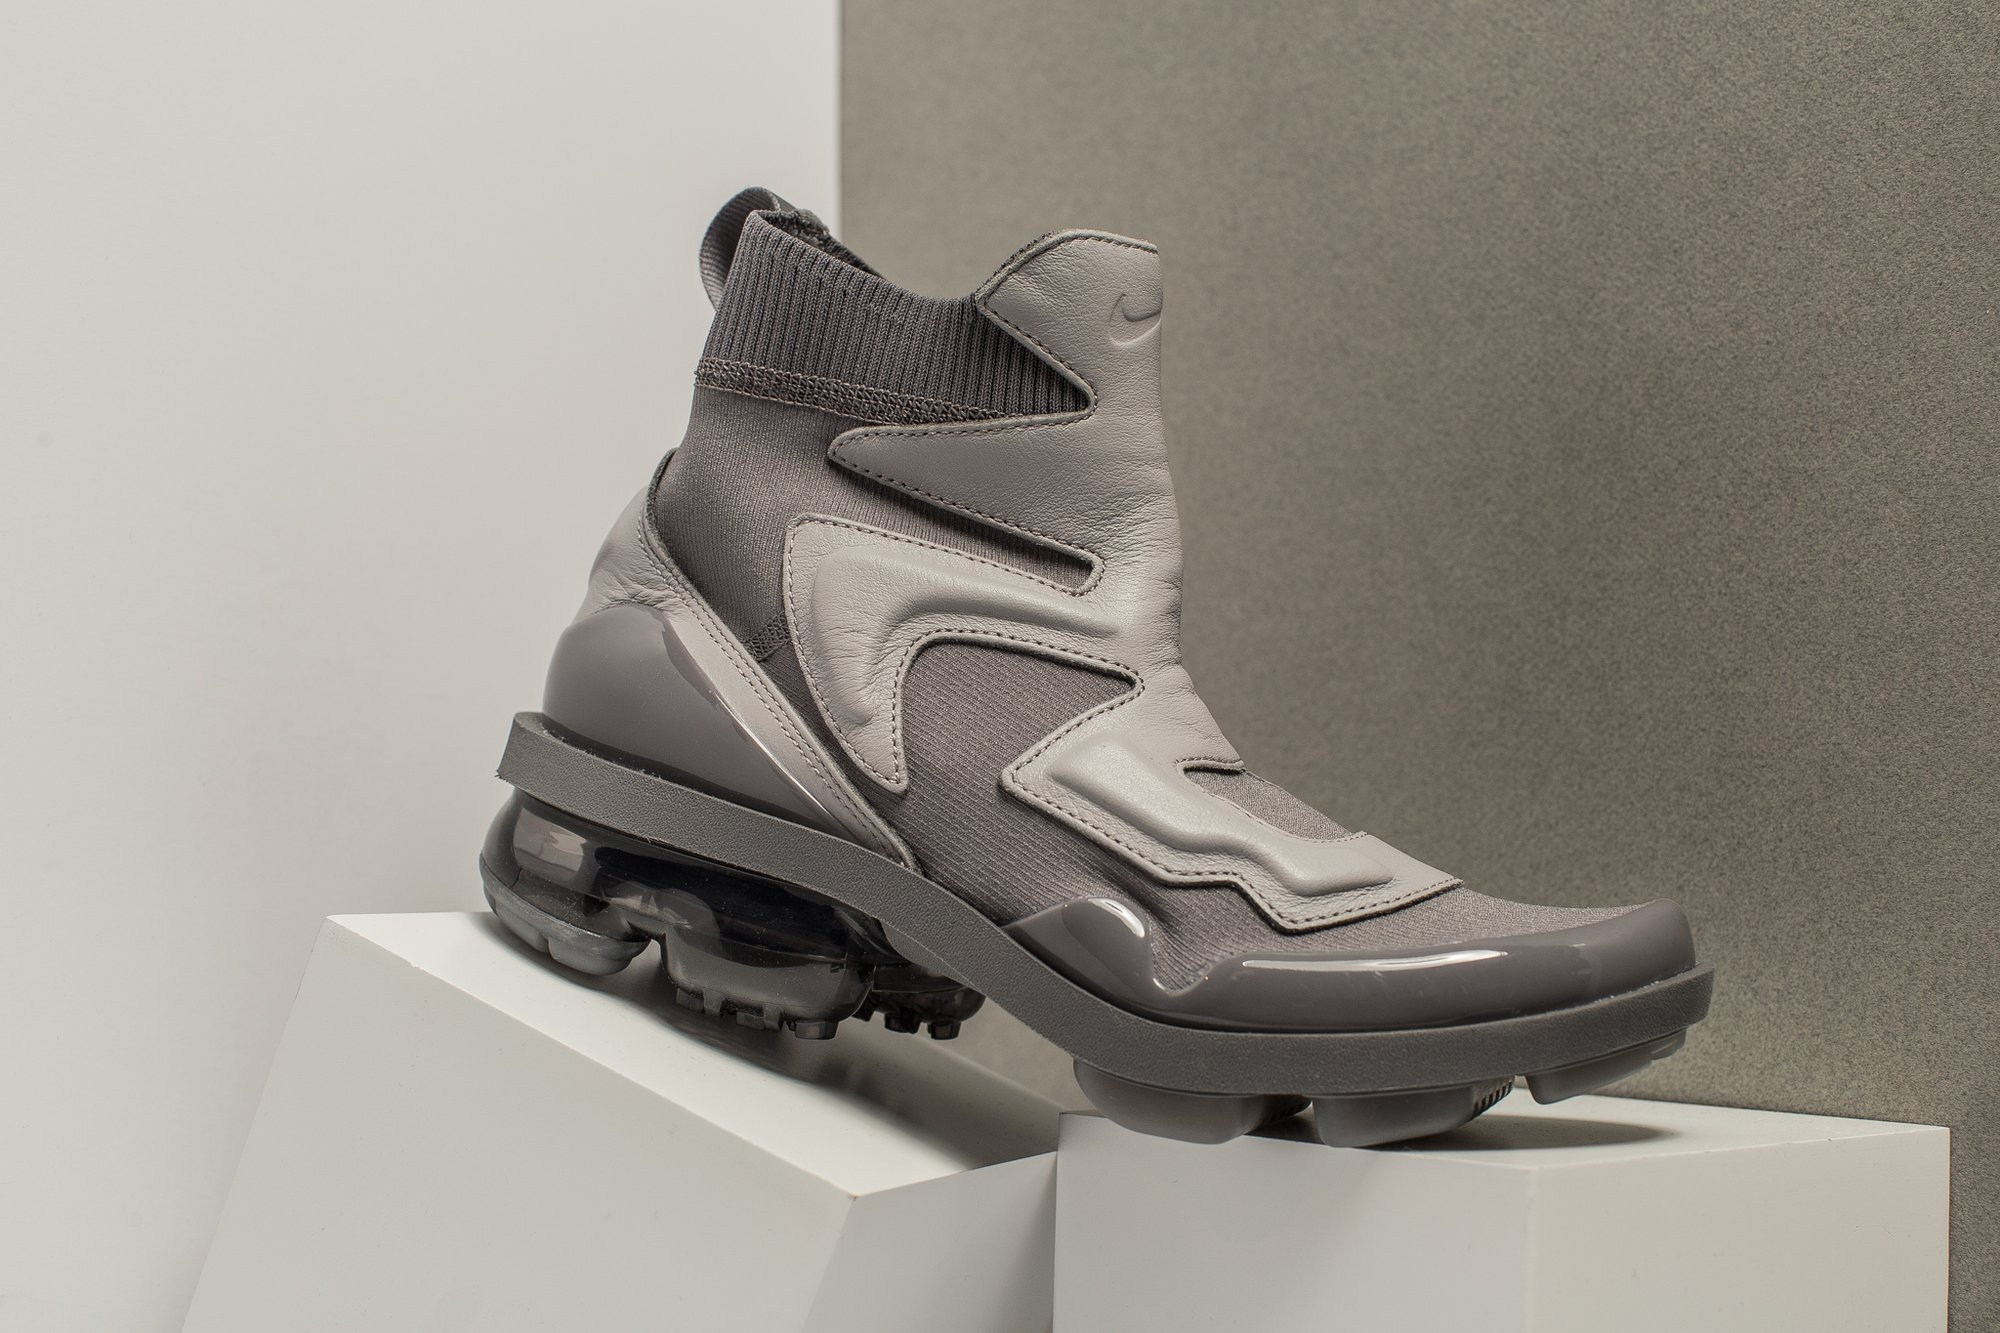 7080a96db47 nike vapormax light 2 boot womens - WearTesters